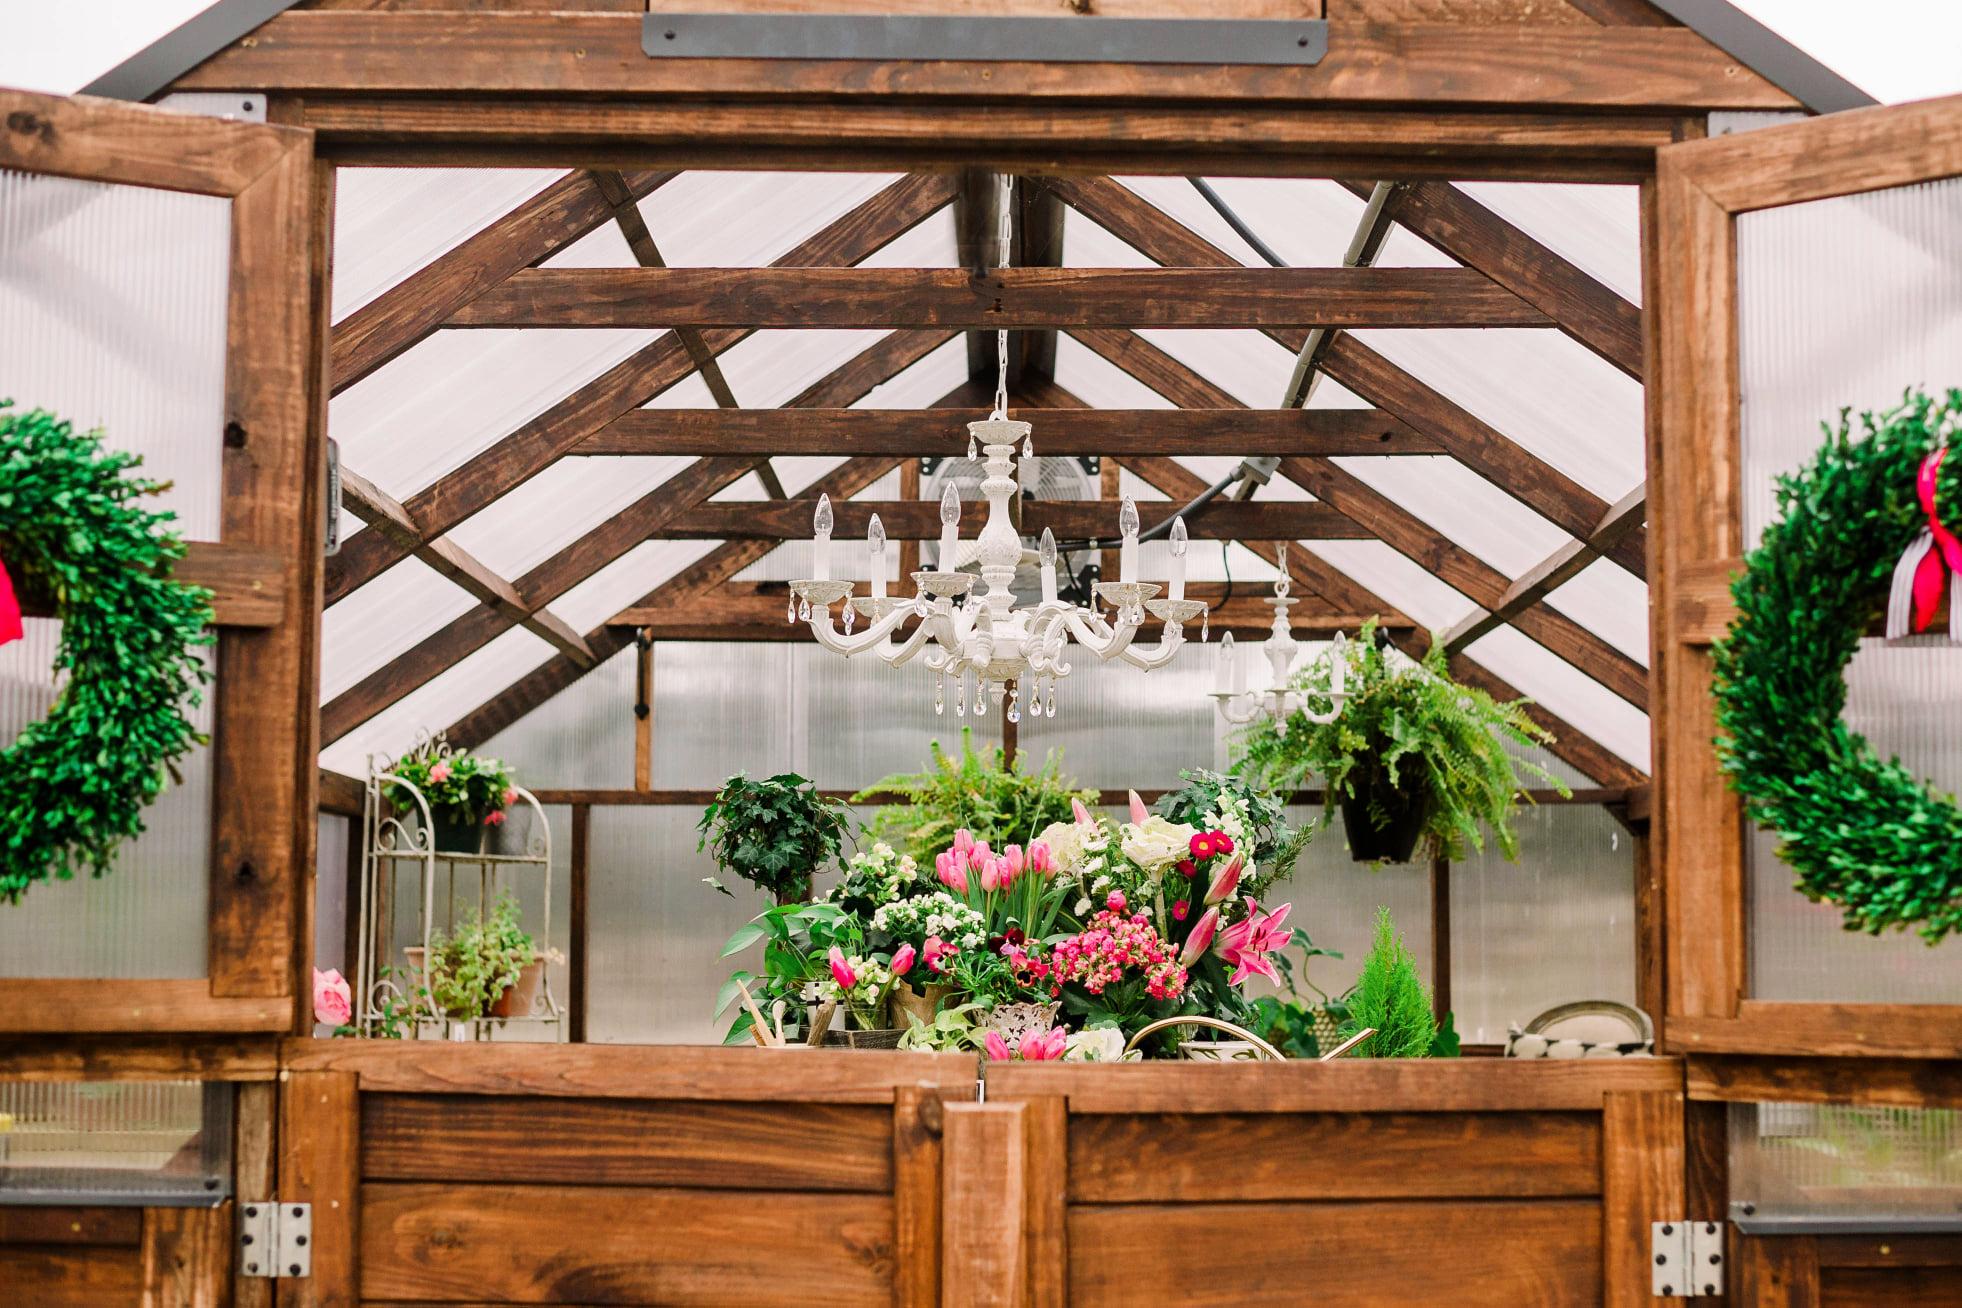 Yoderbilt Greenhouse